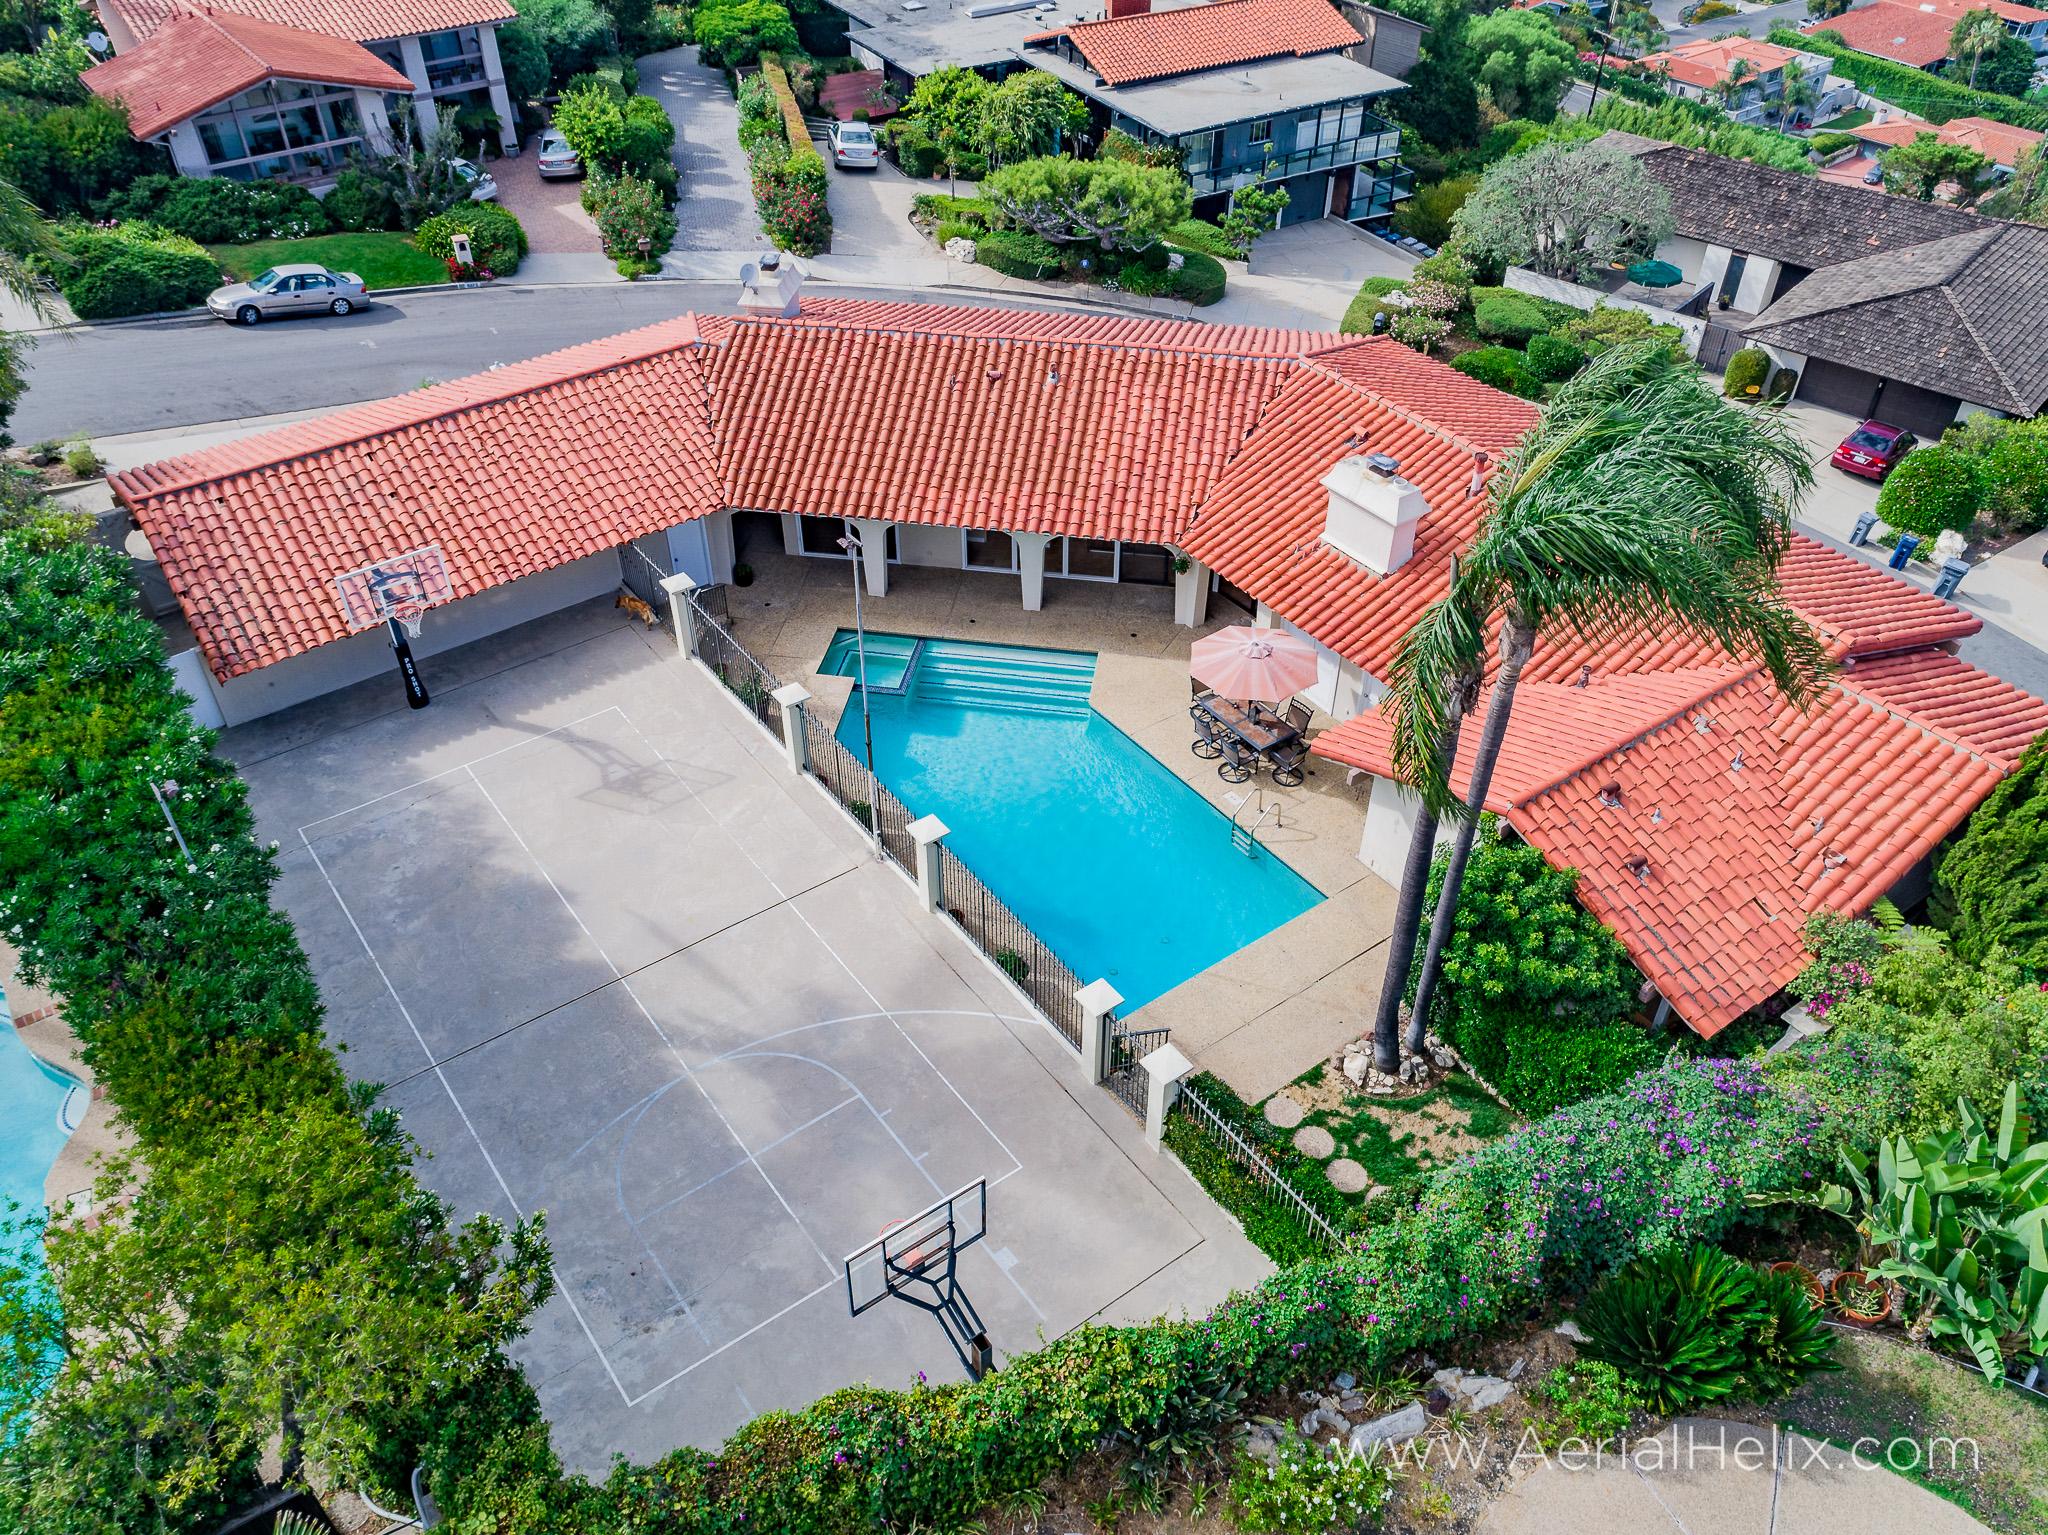 Woodfern Drive - HELIX Real Estate Aerial Photographer-2.jpg